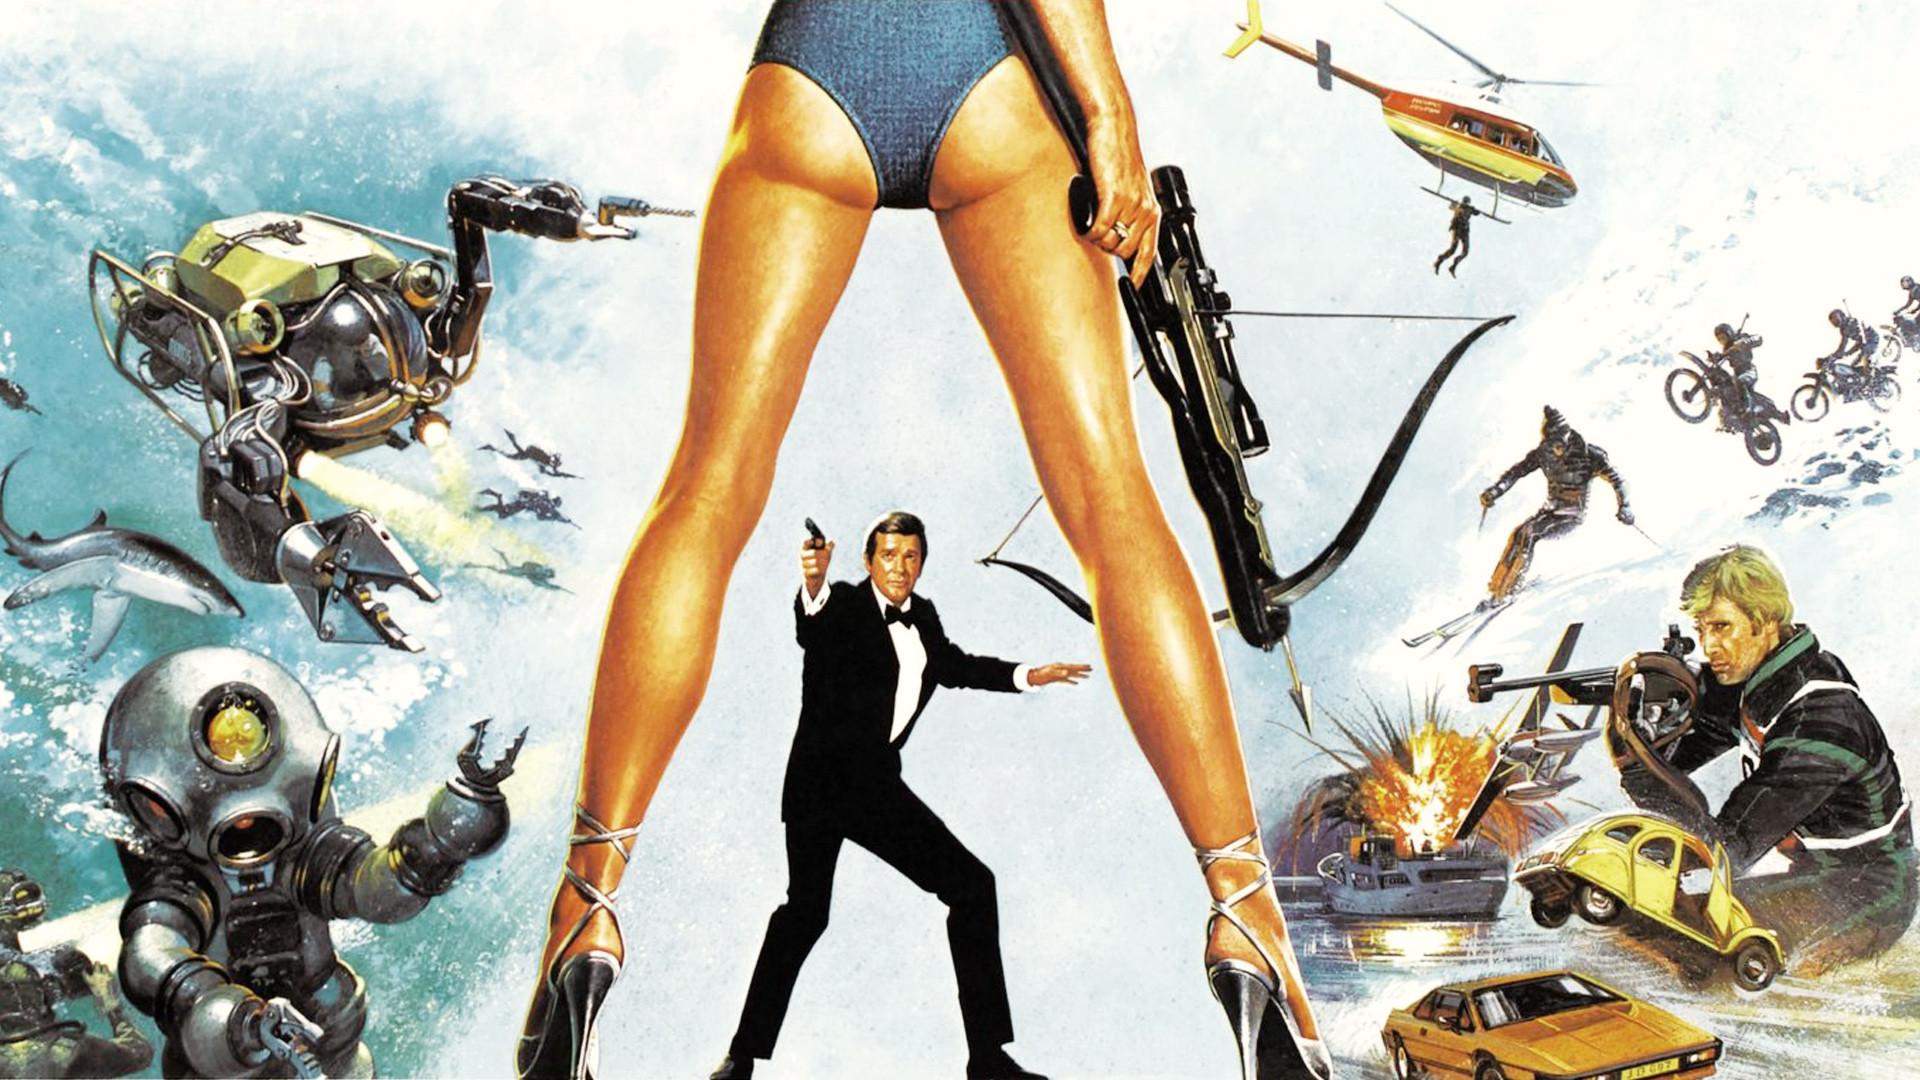 007-wallpaper-free-download.jpg